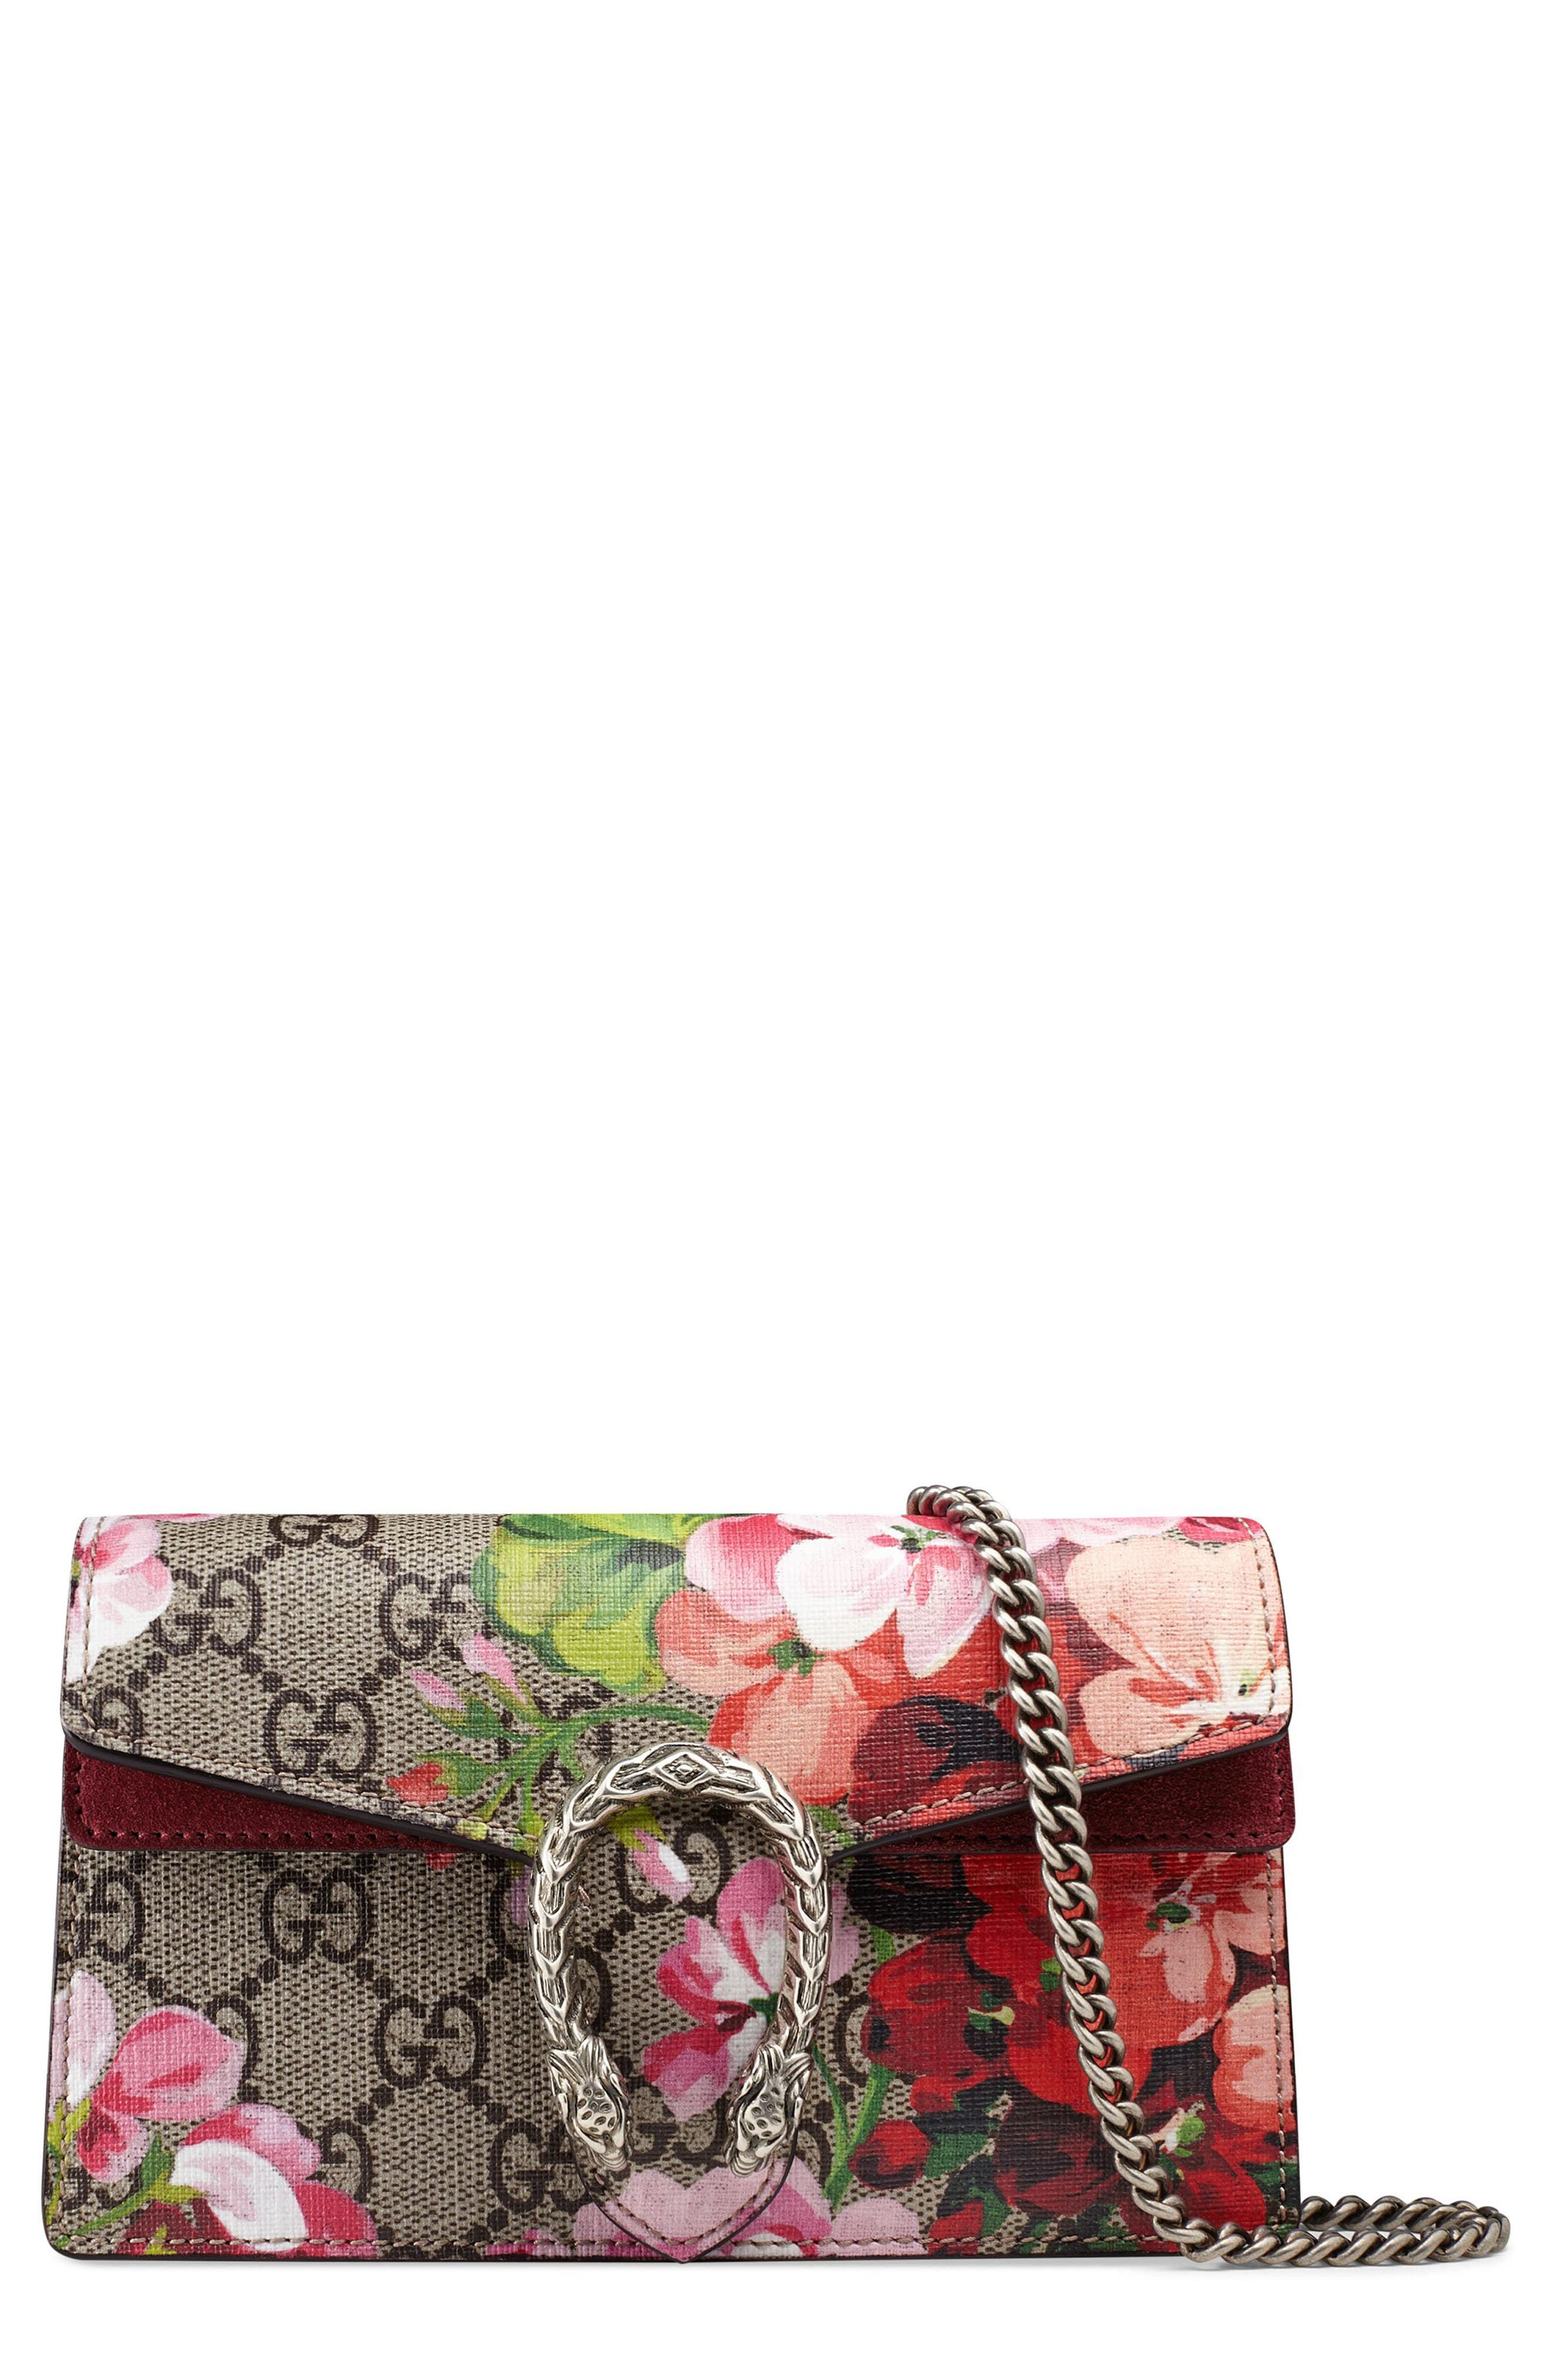 Alternate Image 1 Selected - Gucci Super Mini Dionysus GG Blooms Canvas Shoulder Bag